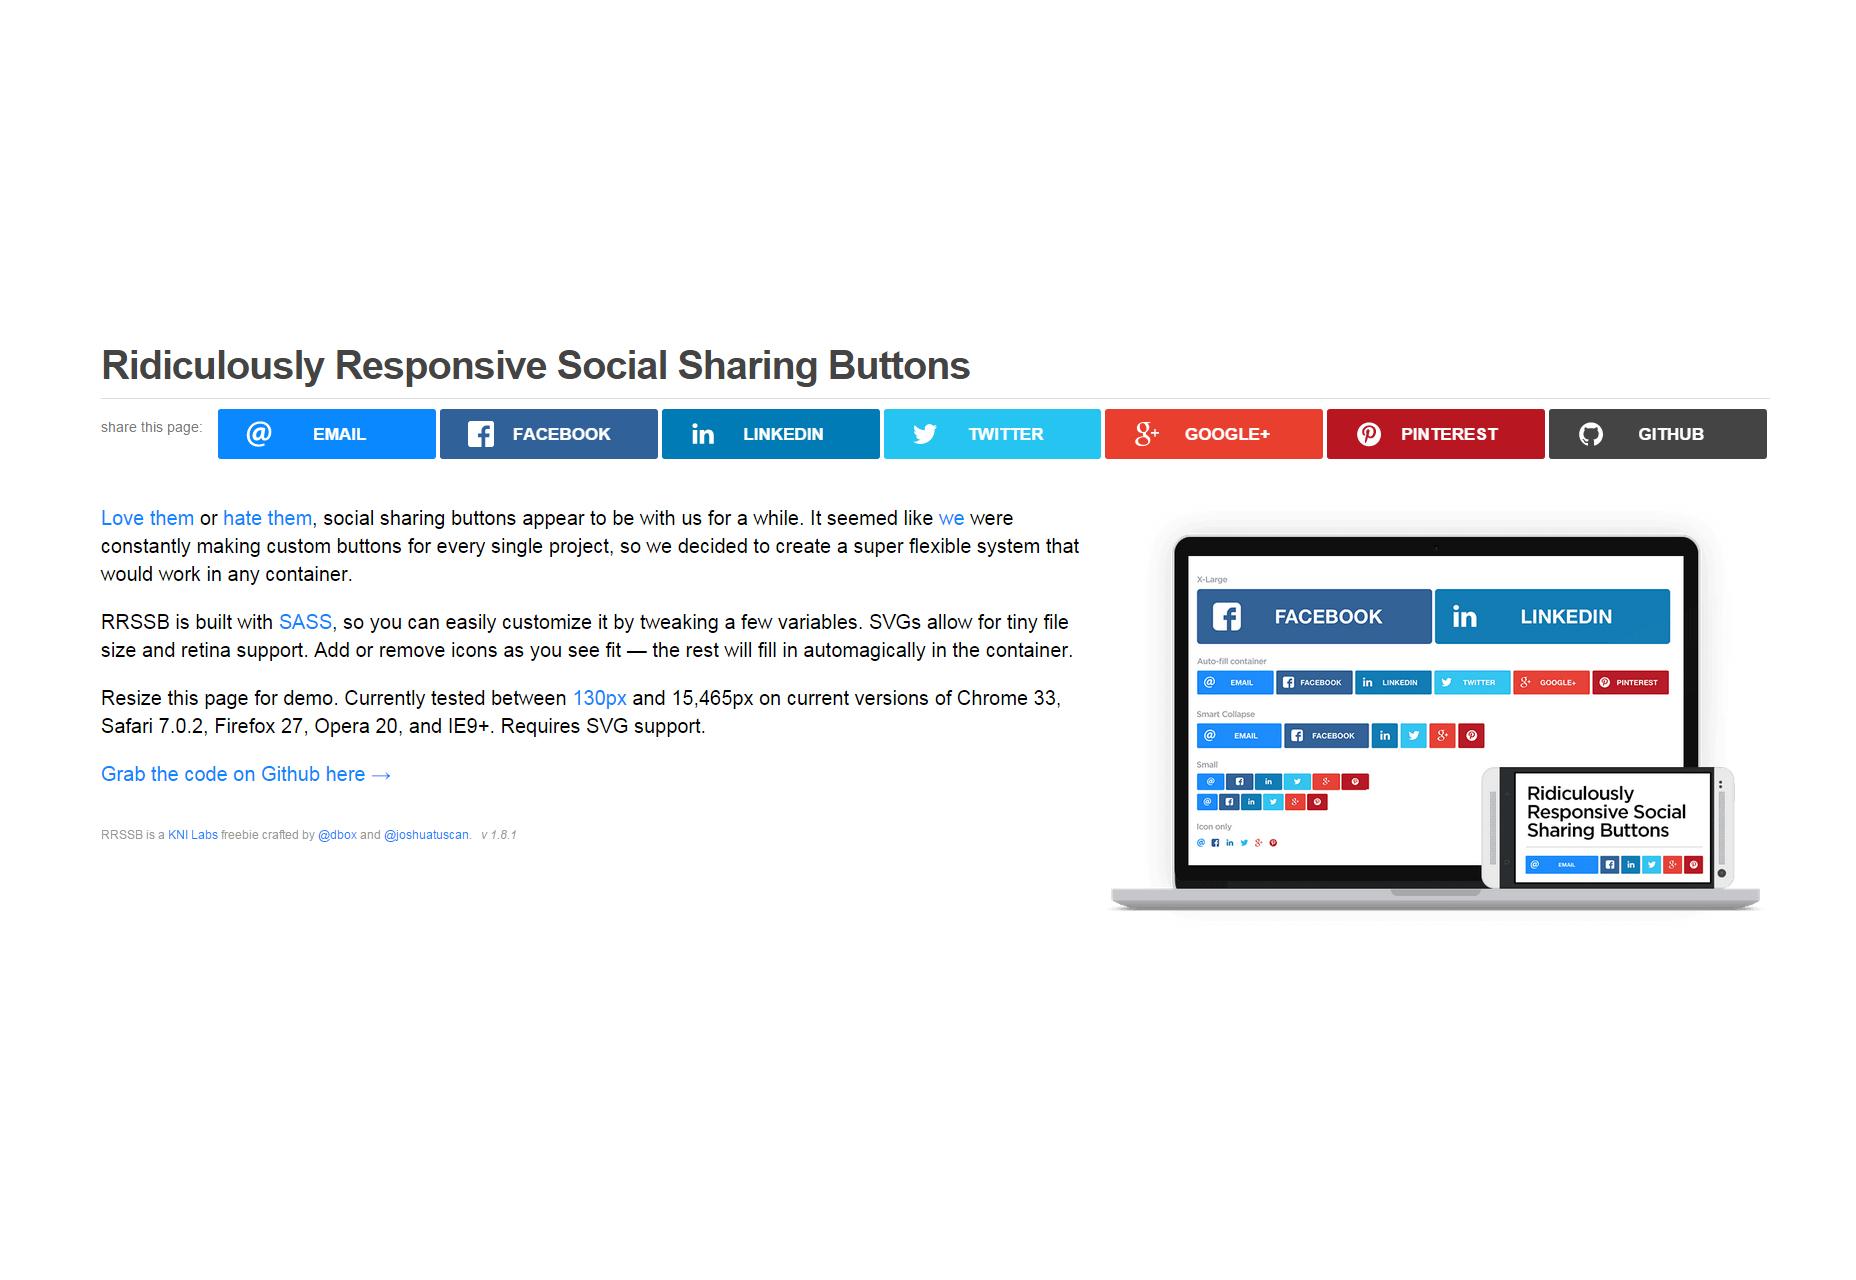 Ridículamente Responsive Social Sharing Buttons